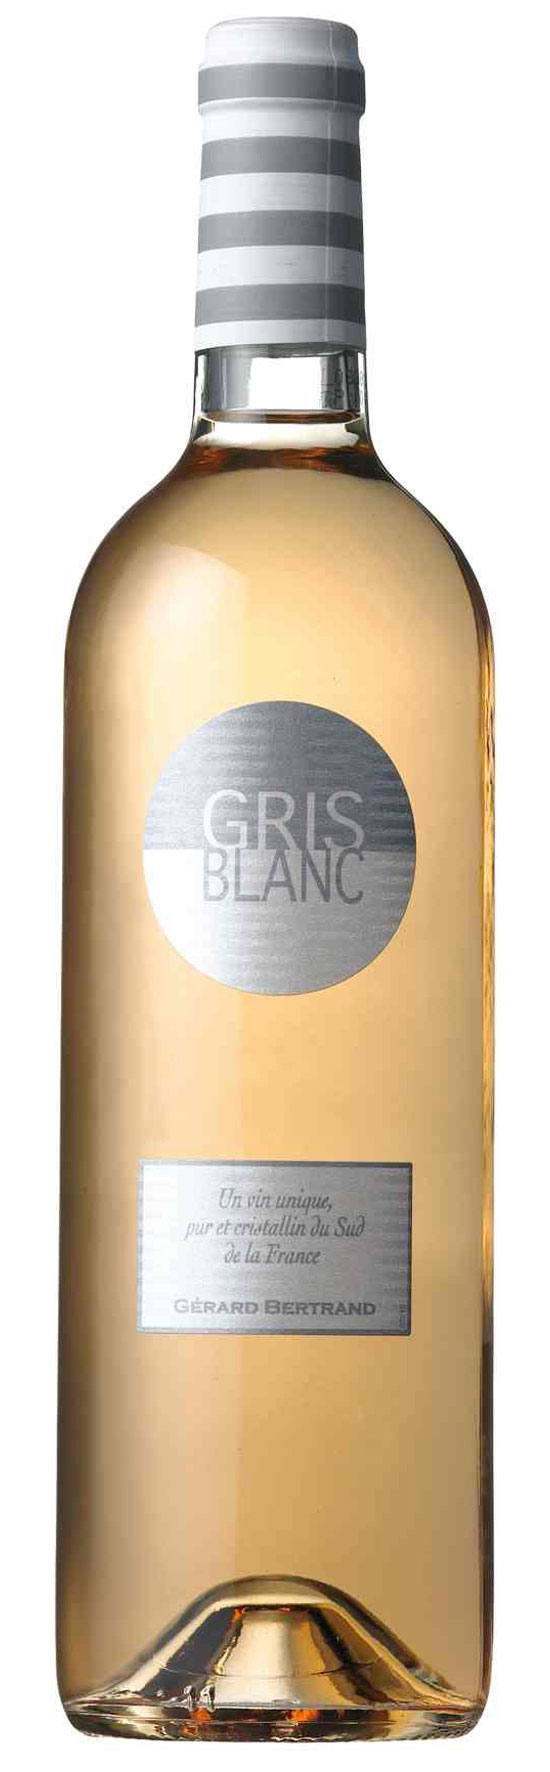 Gerard Bertrand Gris Blanc Vin de Pays 2020